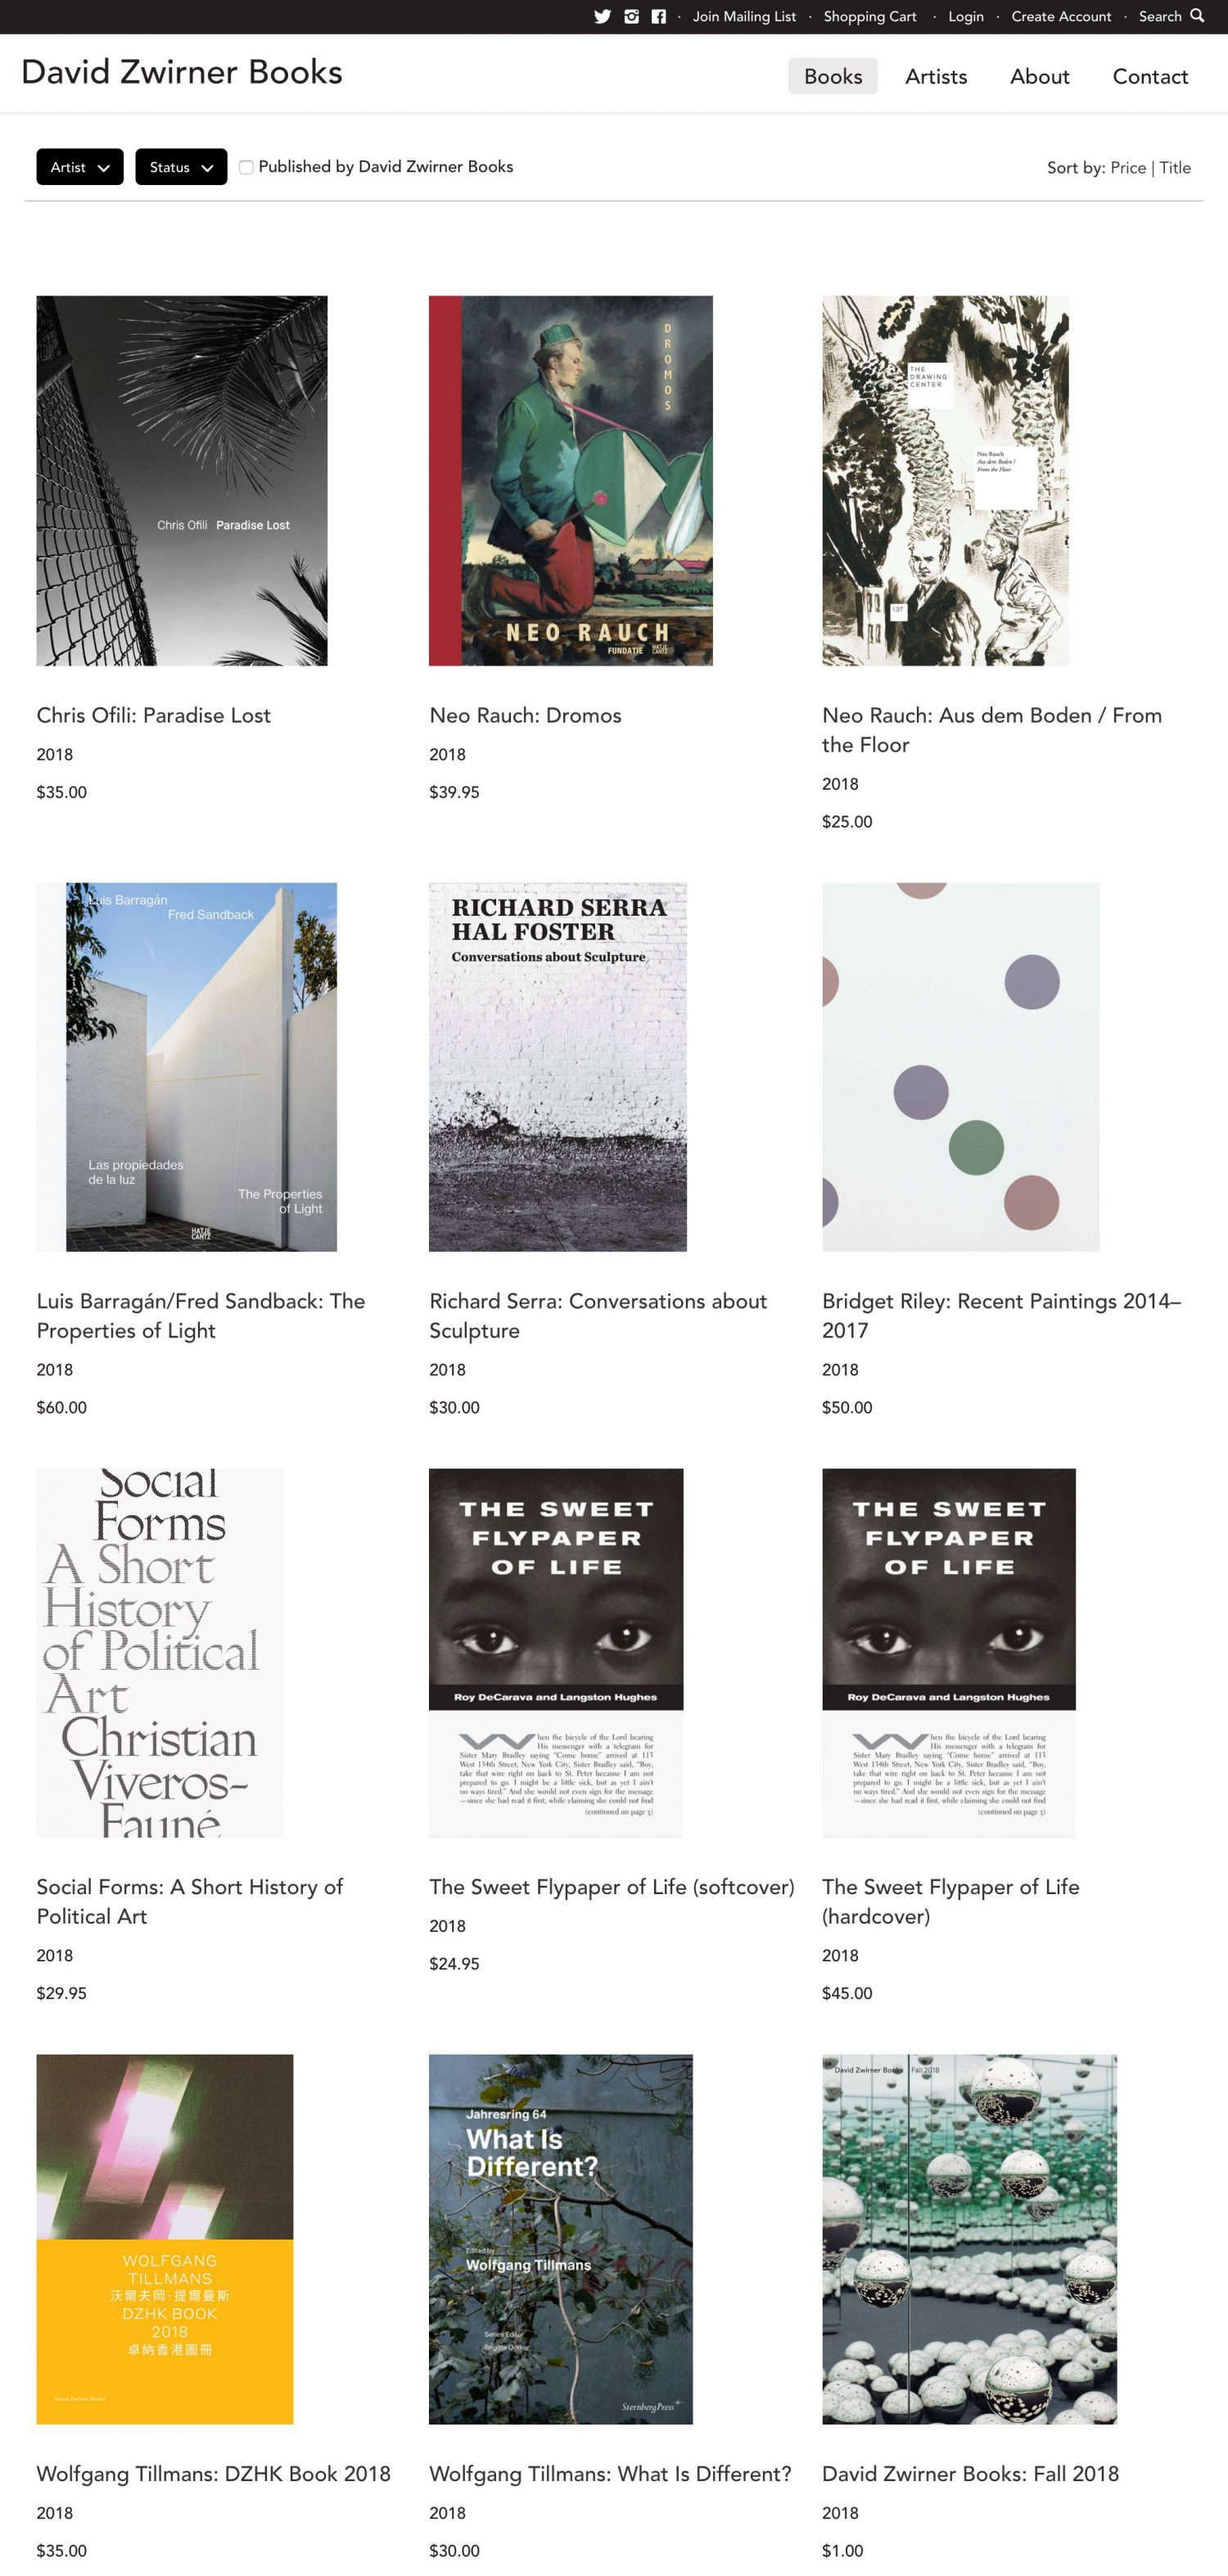 Screenshot of the David Zwirner Books website's books landing page